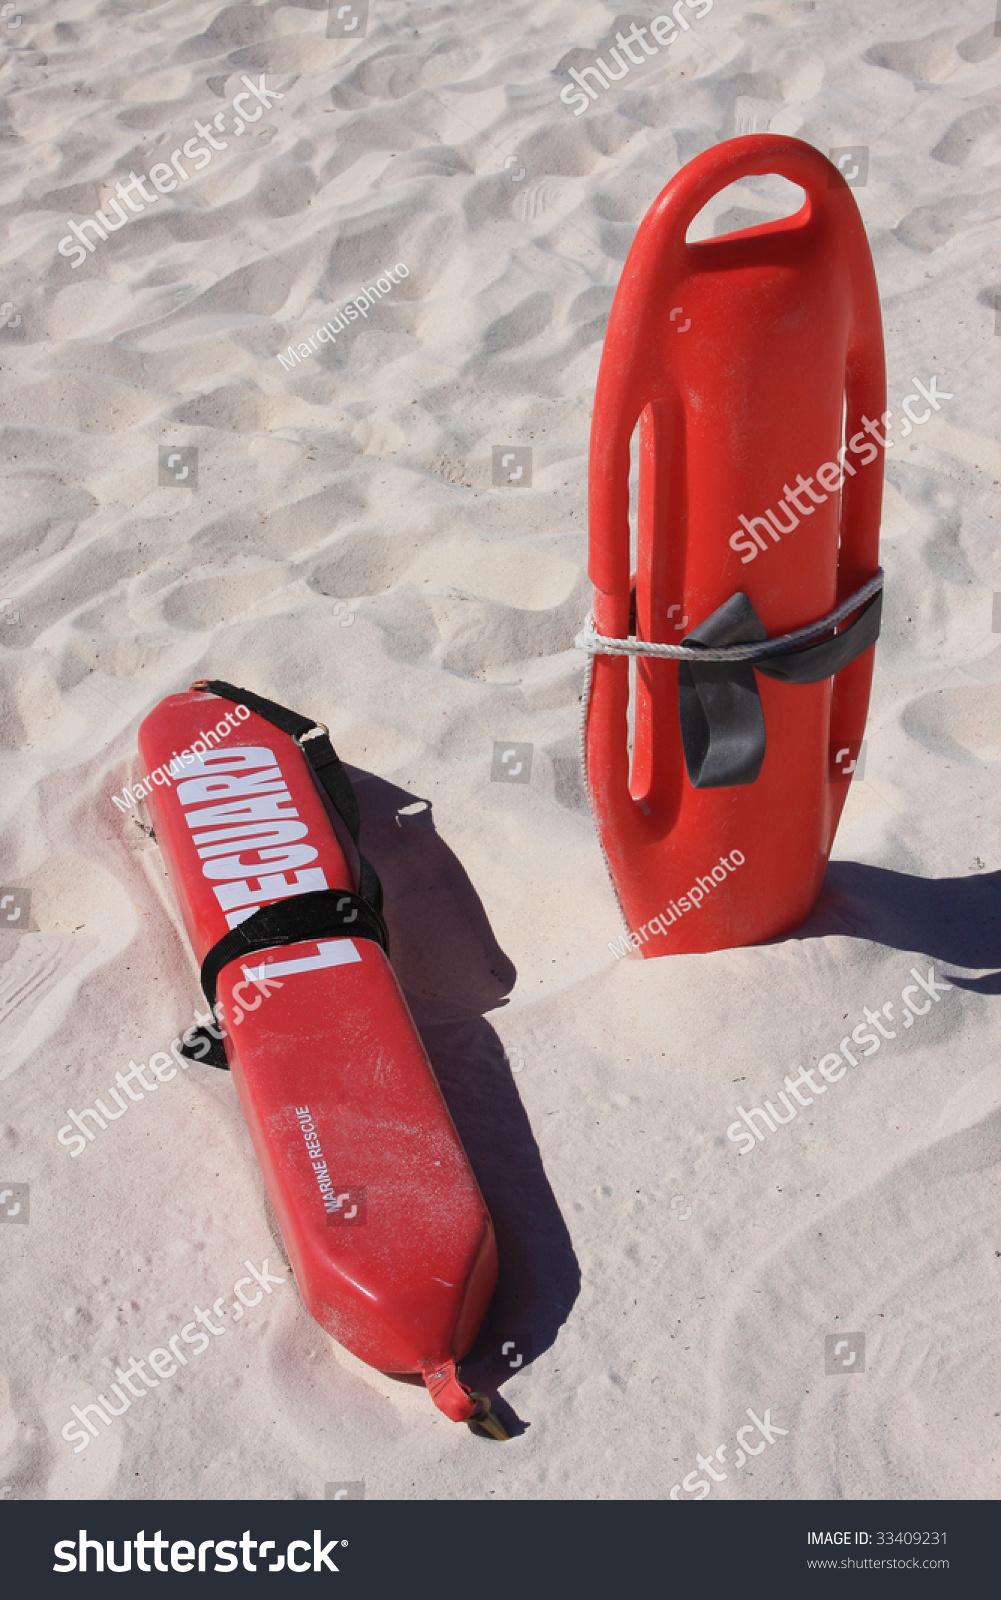 Lifeguard Rescue Equipment On Beach Stock Photo 33409231 Shutterstock